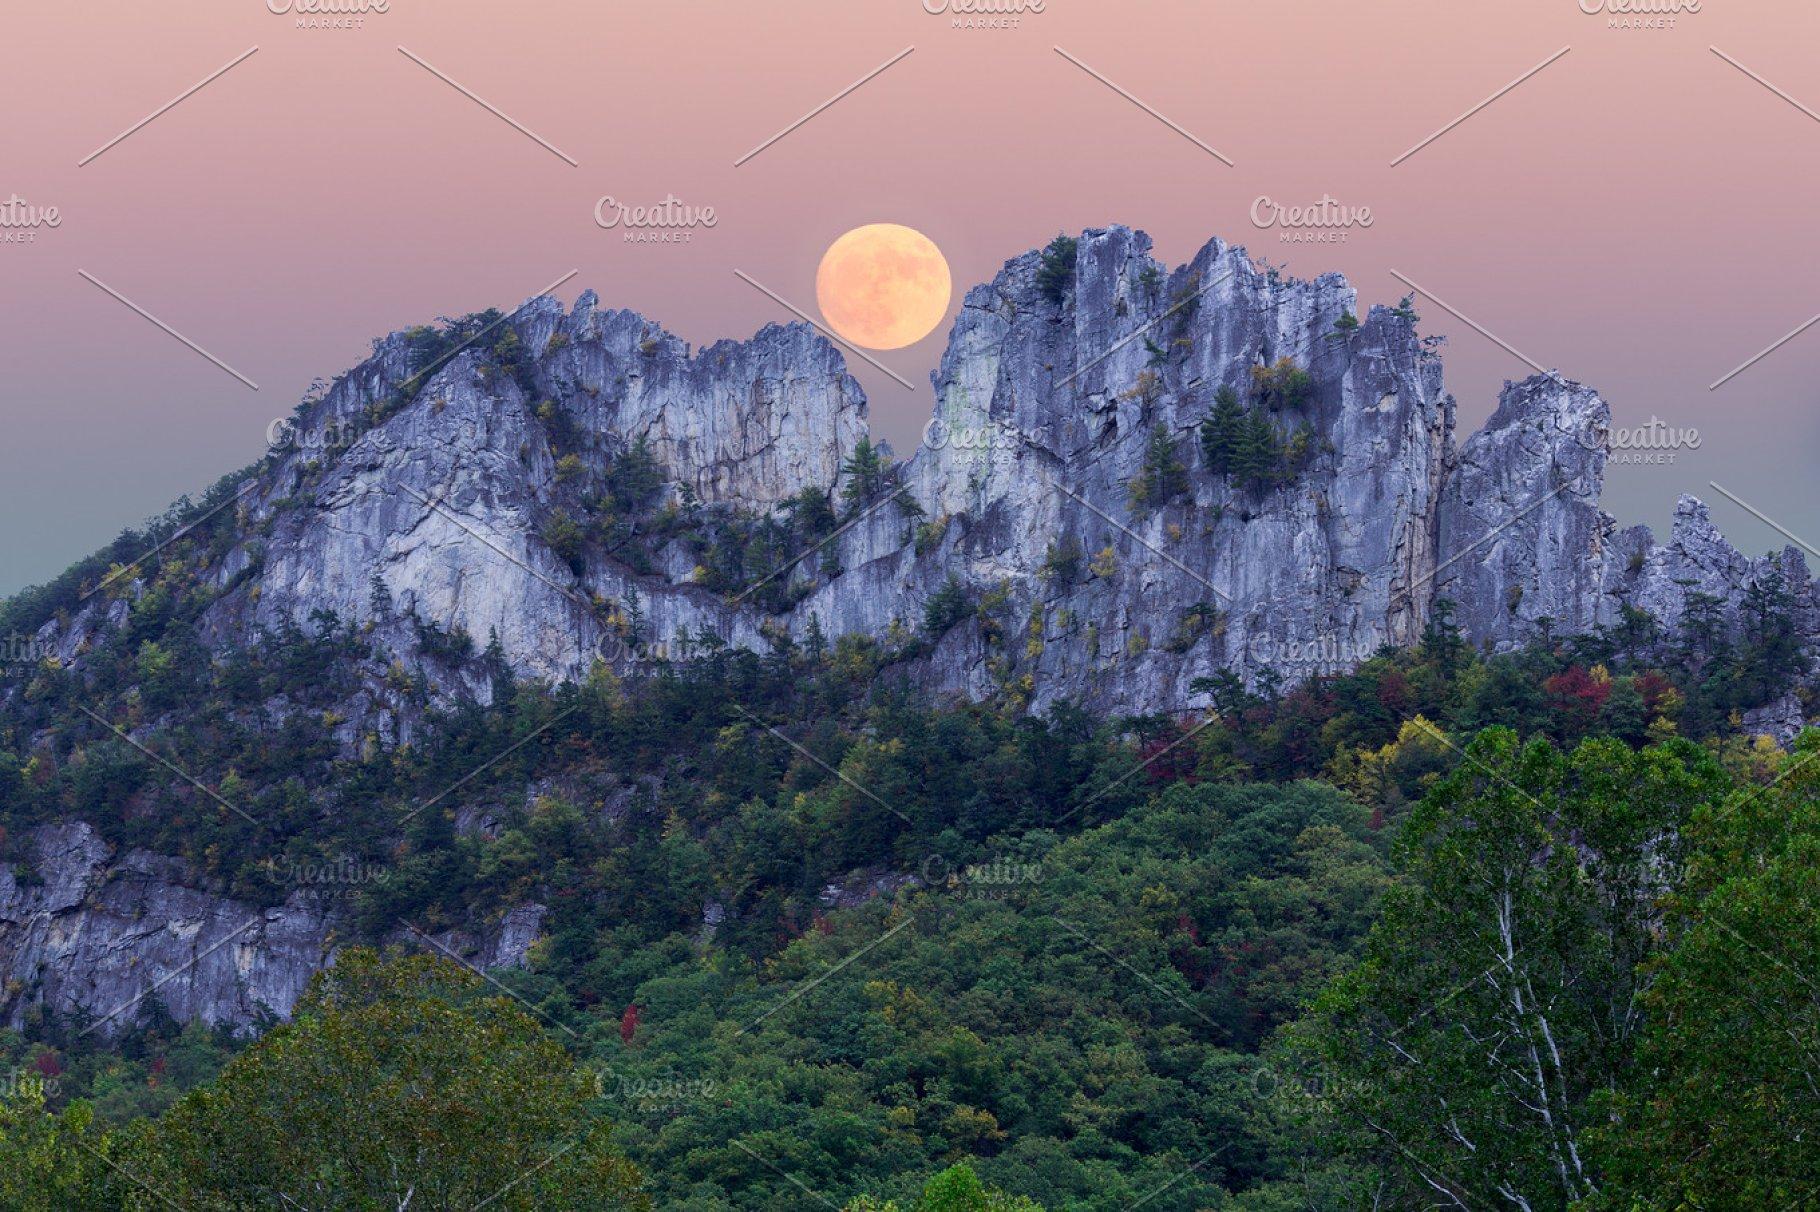 Seneca Rocks Wv >> Supermoon Over Seneca Rocks In West Virginia Nature Photos